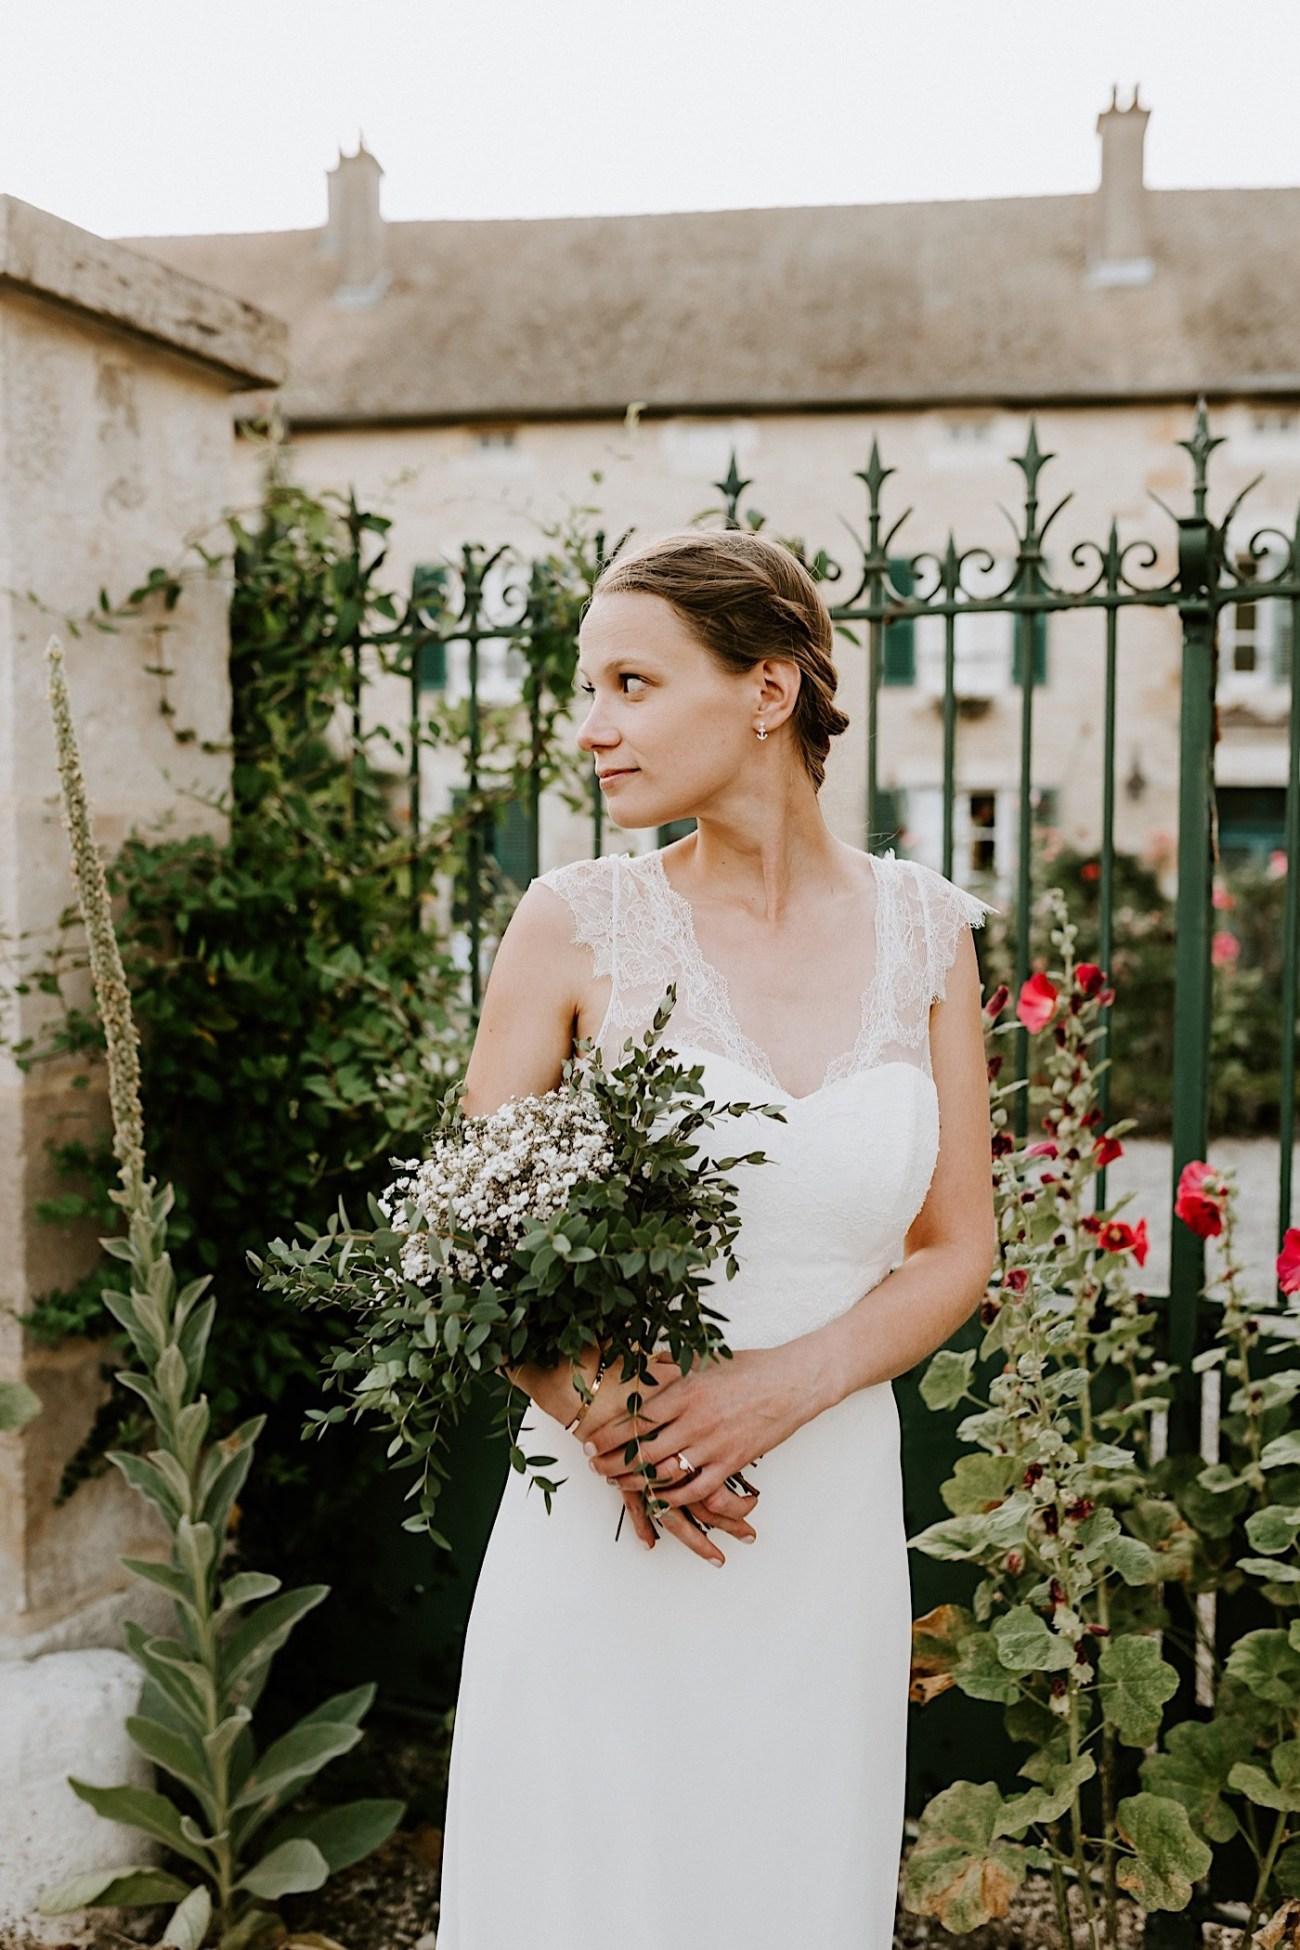 French Rural Wedding After Wedding Day Photos Paris Wedding Photographer 016